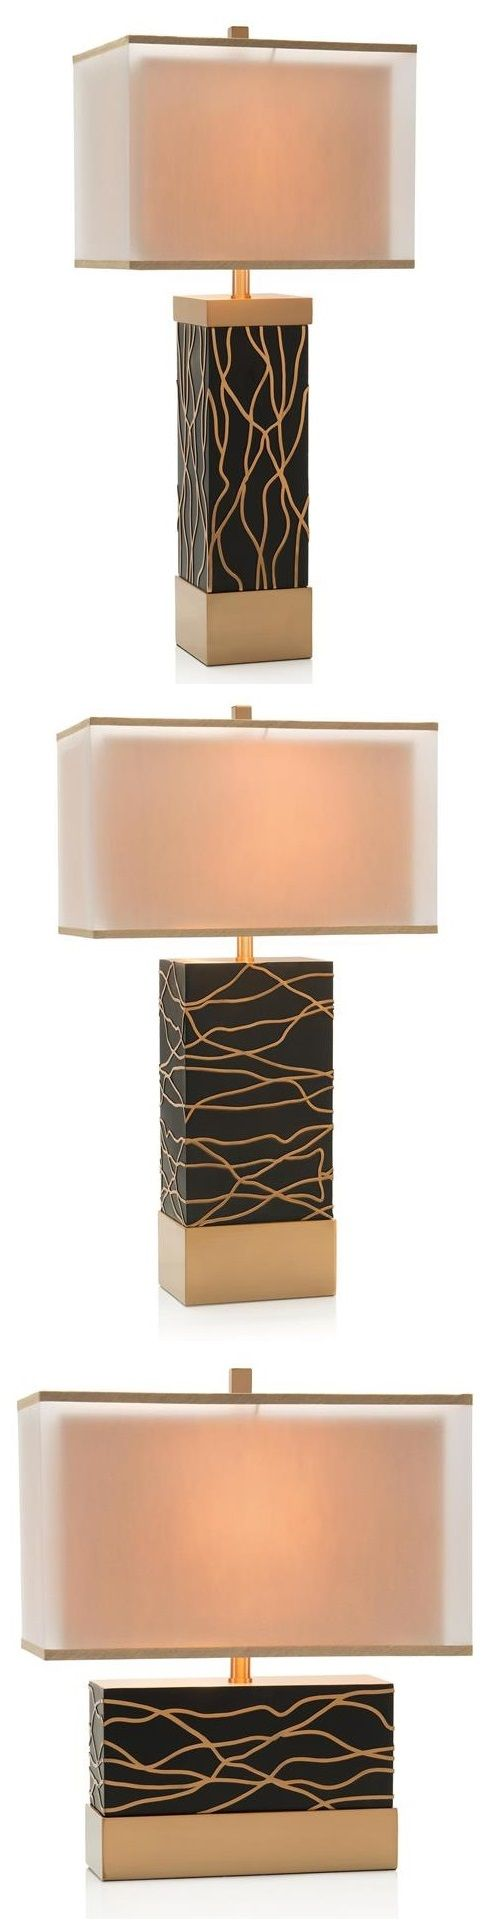 Luxury Lamps | Luxury Lamp | Designer Lamp | Designer ...